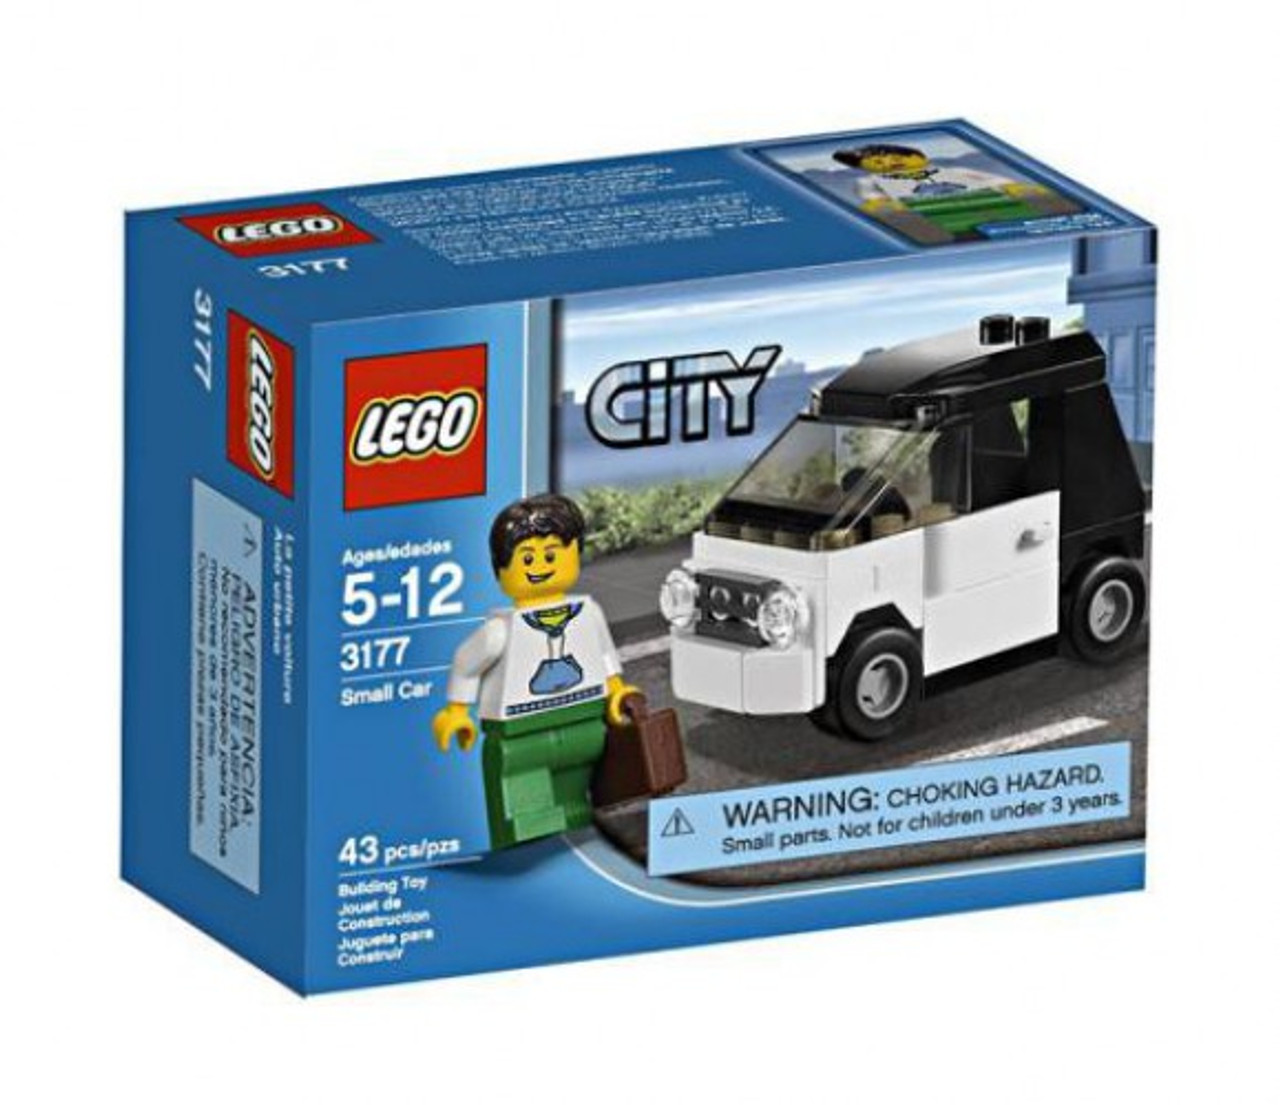 LEGO City Small Car Set #3177